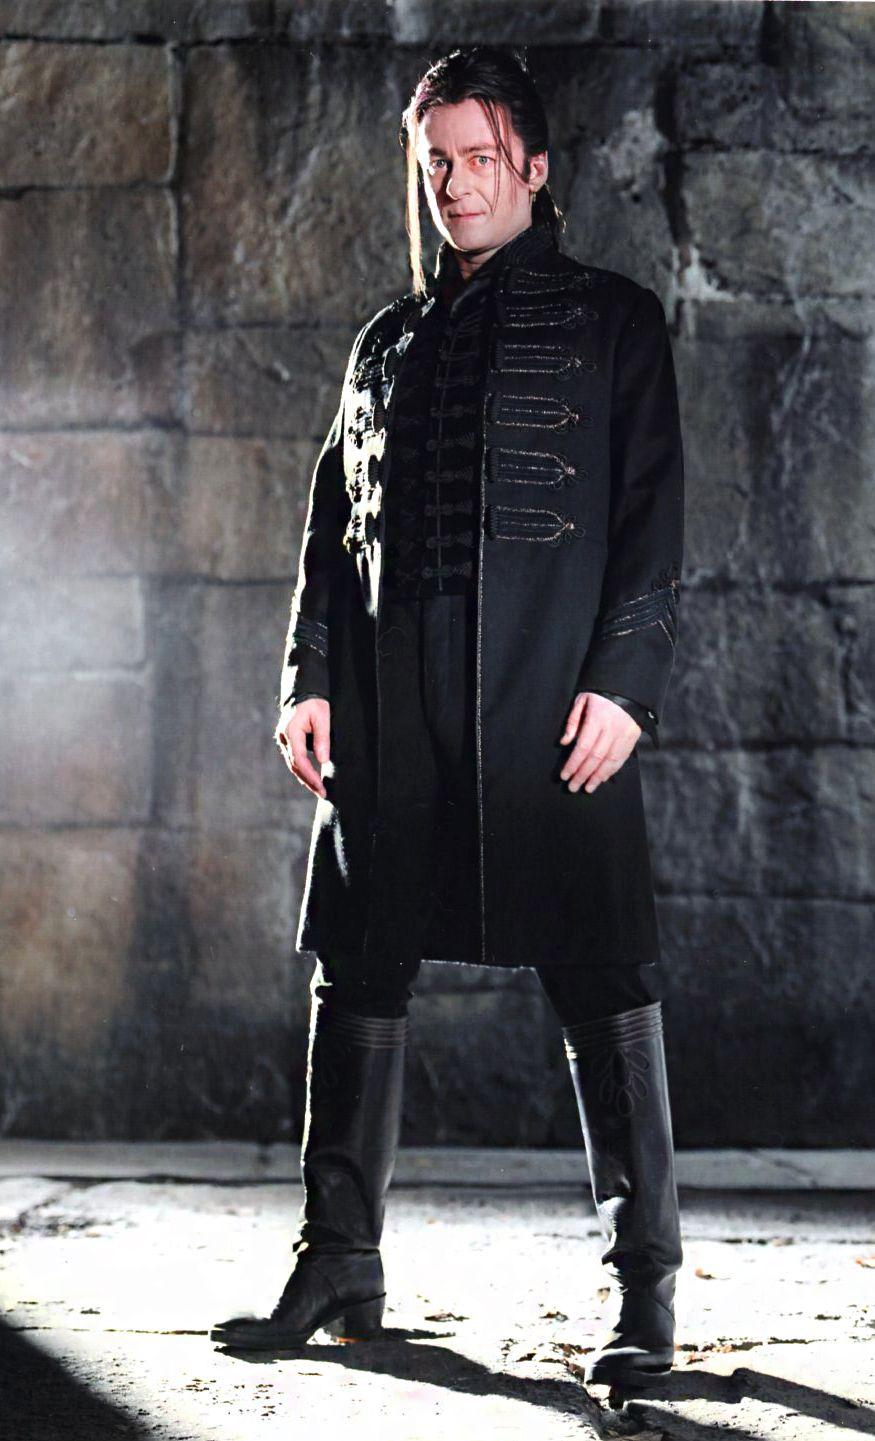 Count Dracula (Van Helsing)/Gallery | Villains Wiki | Fandom